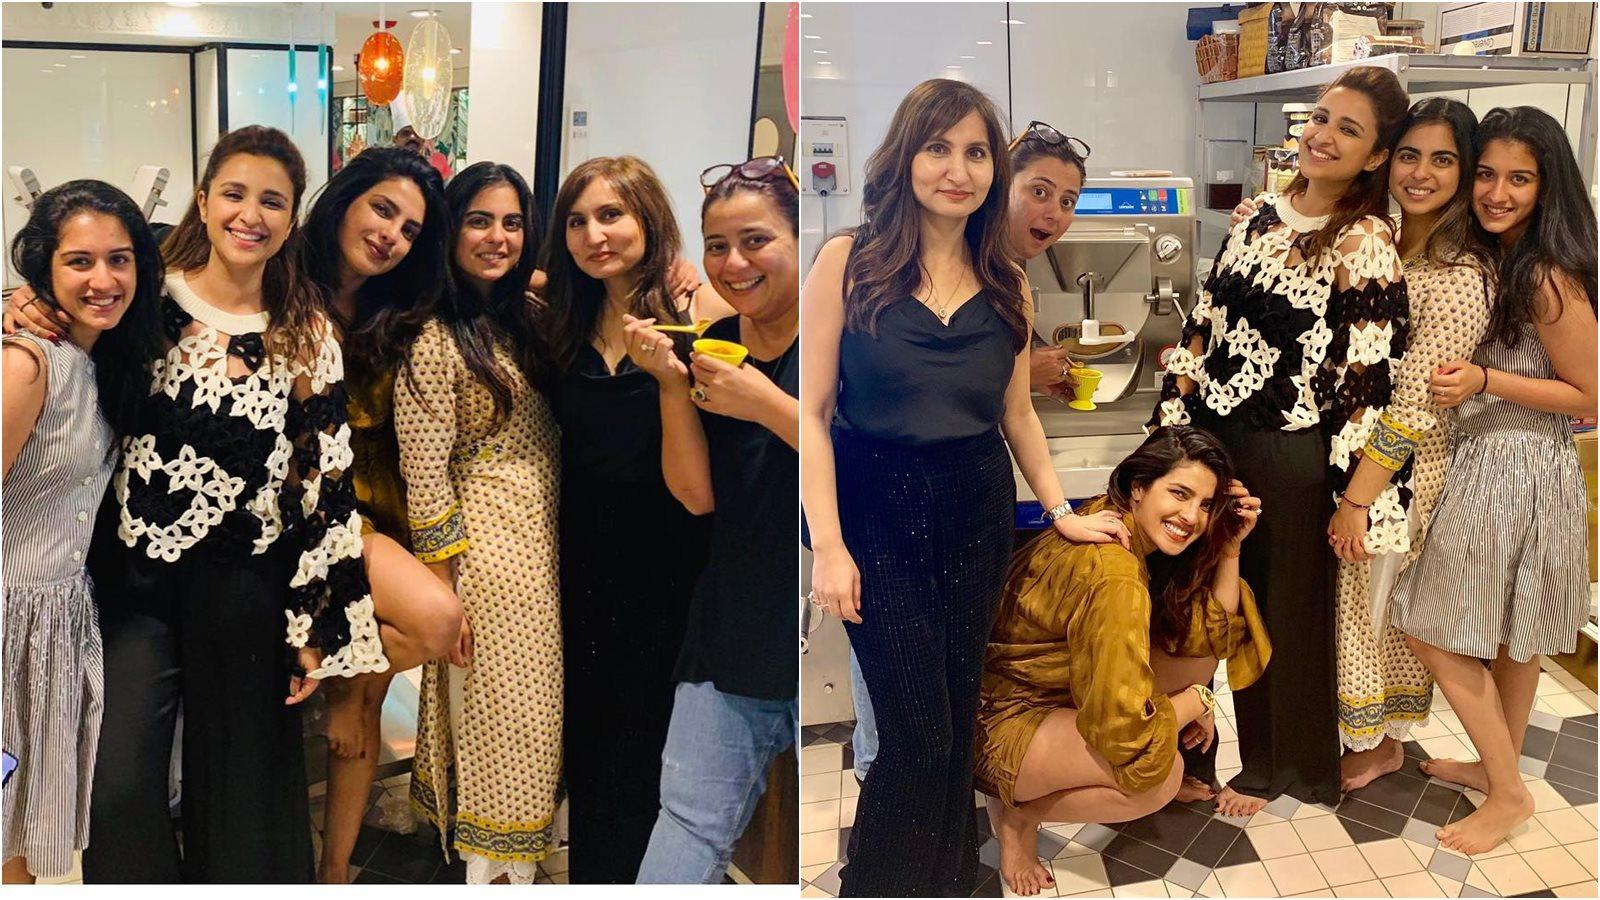 Alia Bhatt misses the 'madness by minutes at Isha Ambani's homemade ice cream feast with Priyanka Chopra and squad